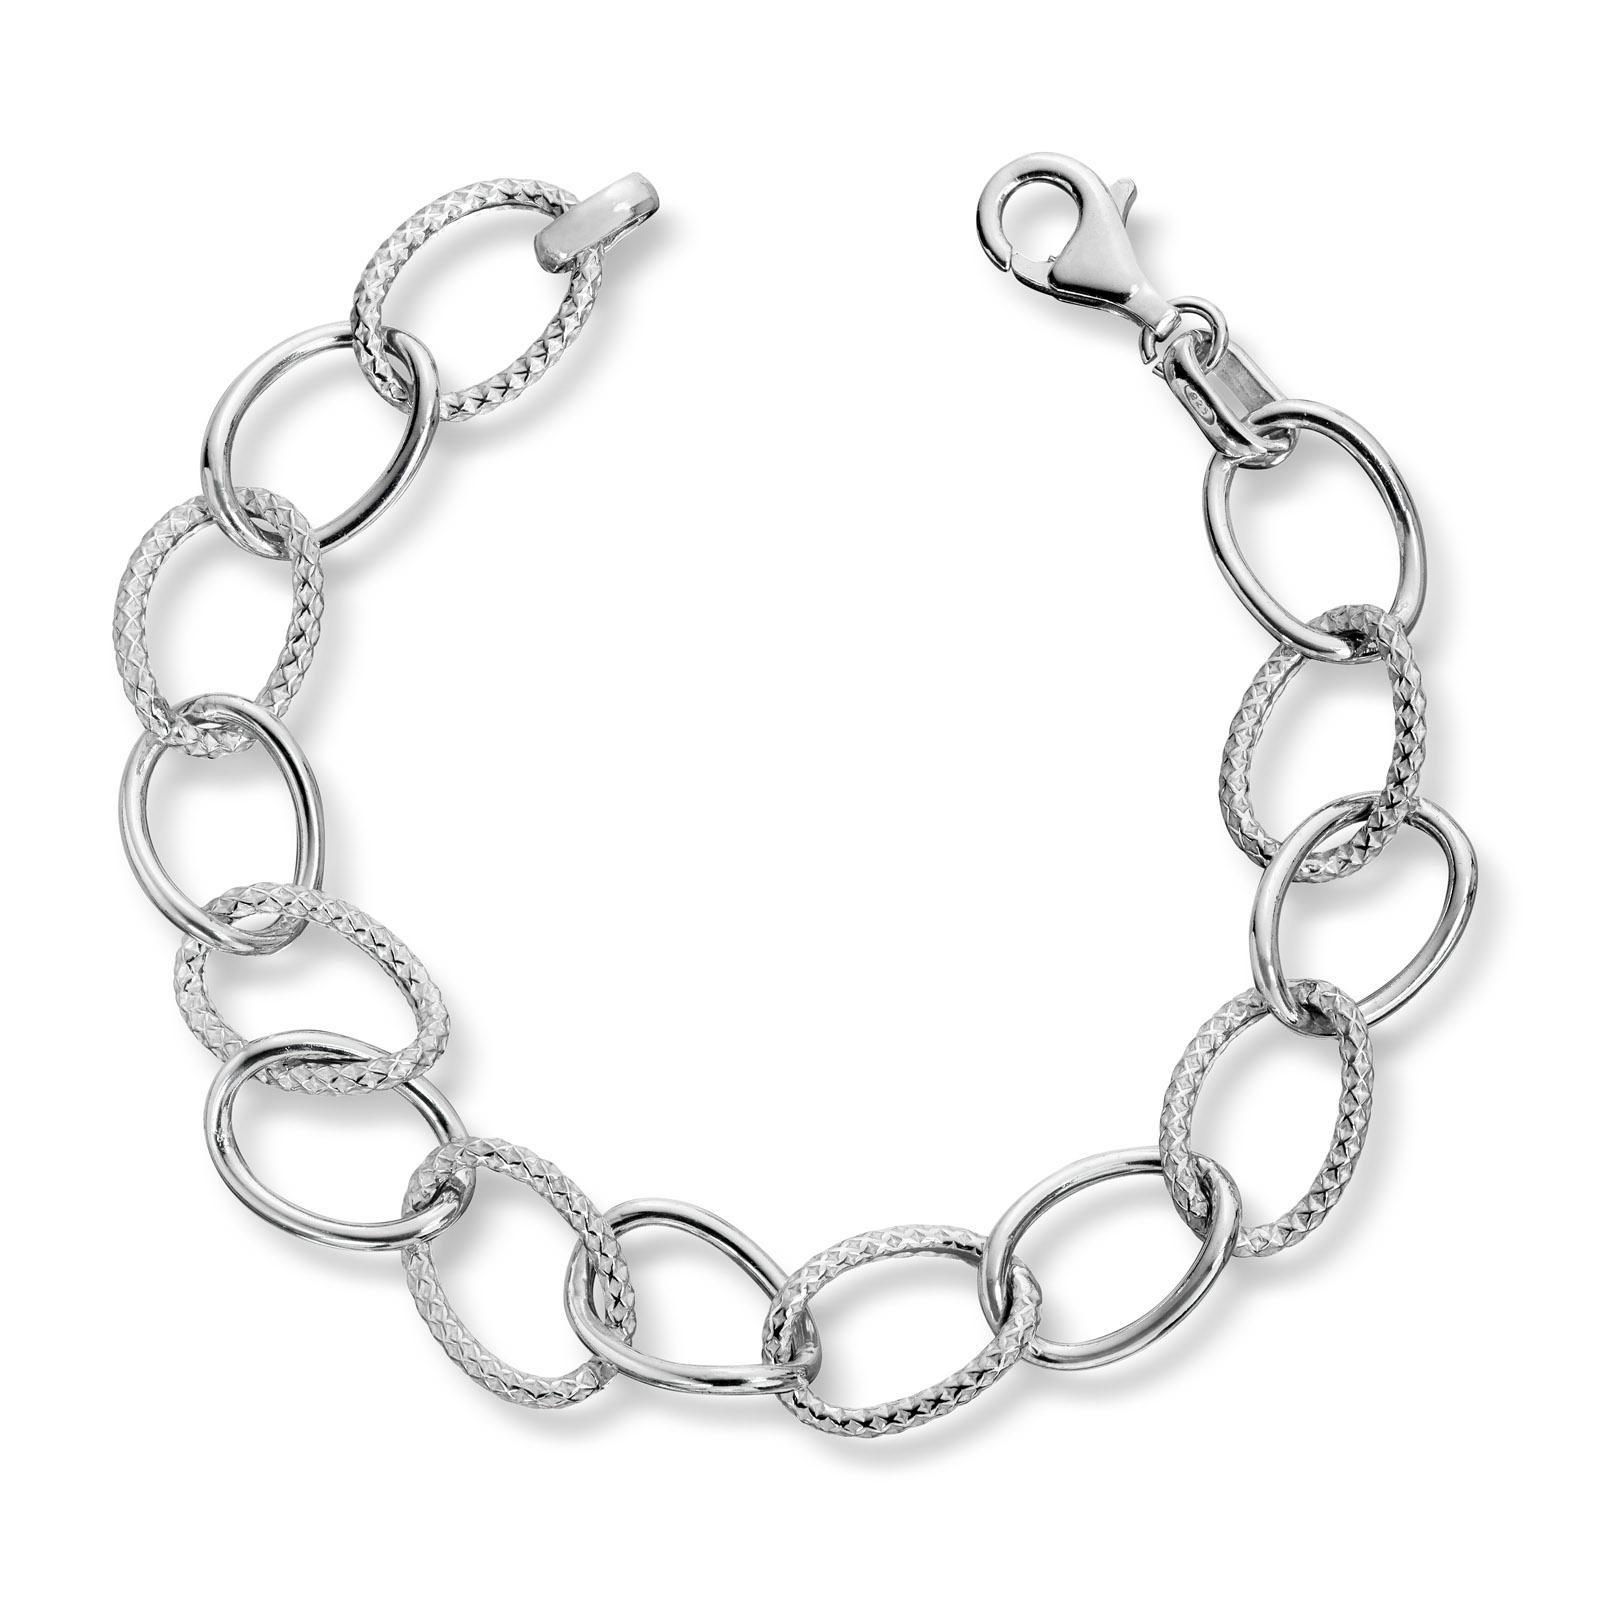 Mestergull Delikat armbånd i sølv MESTERGULL Armbånd